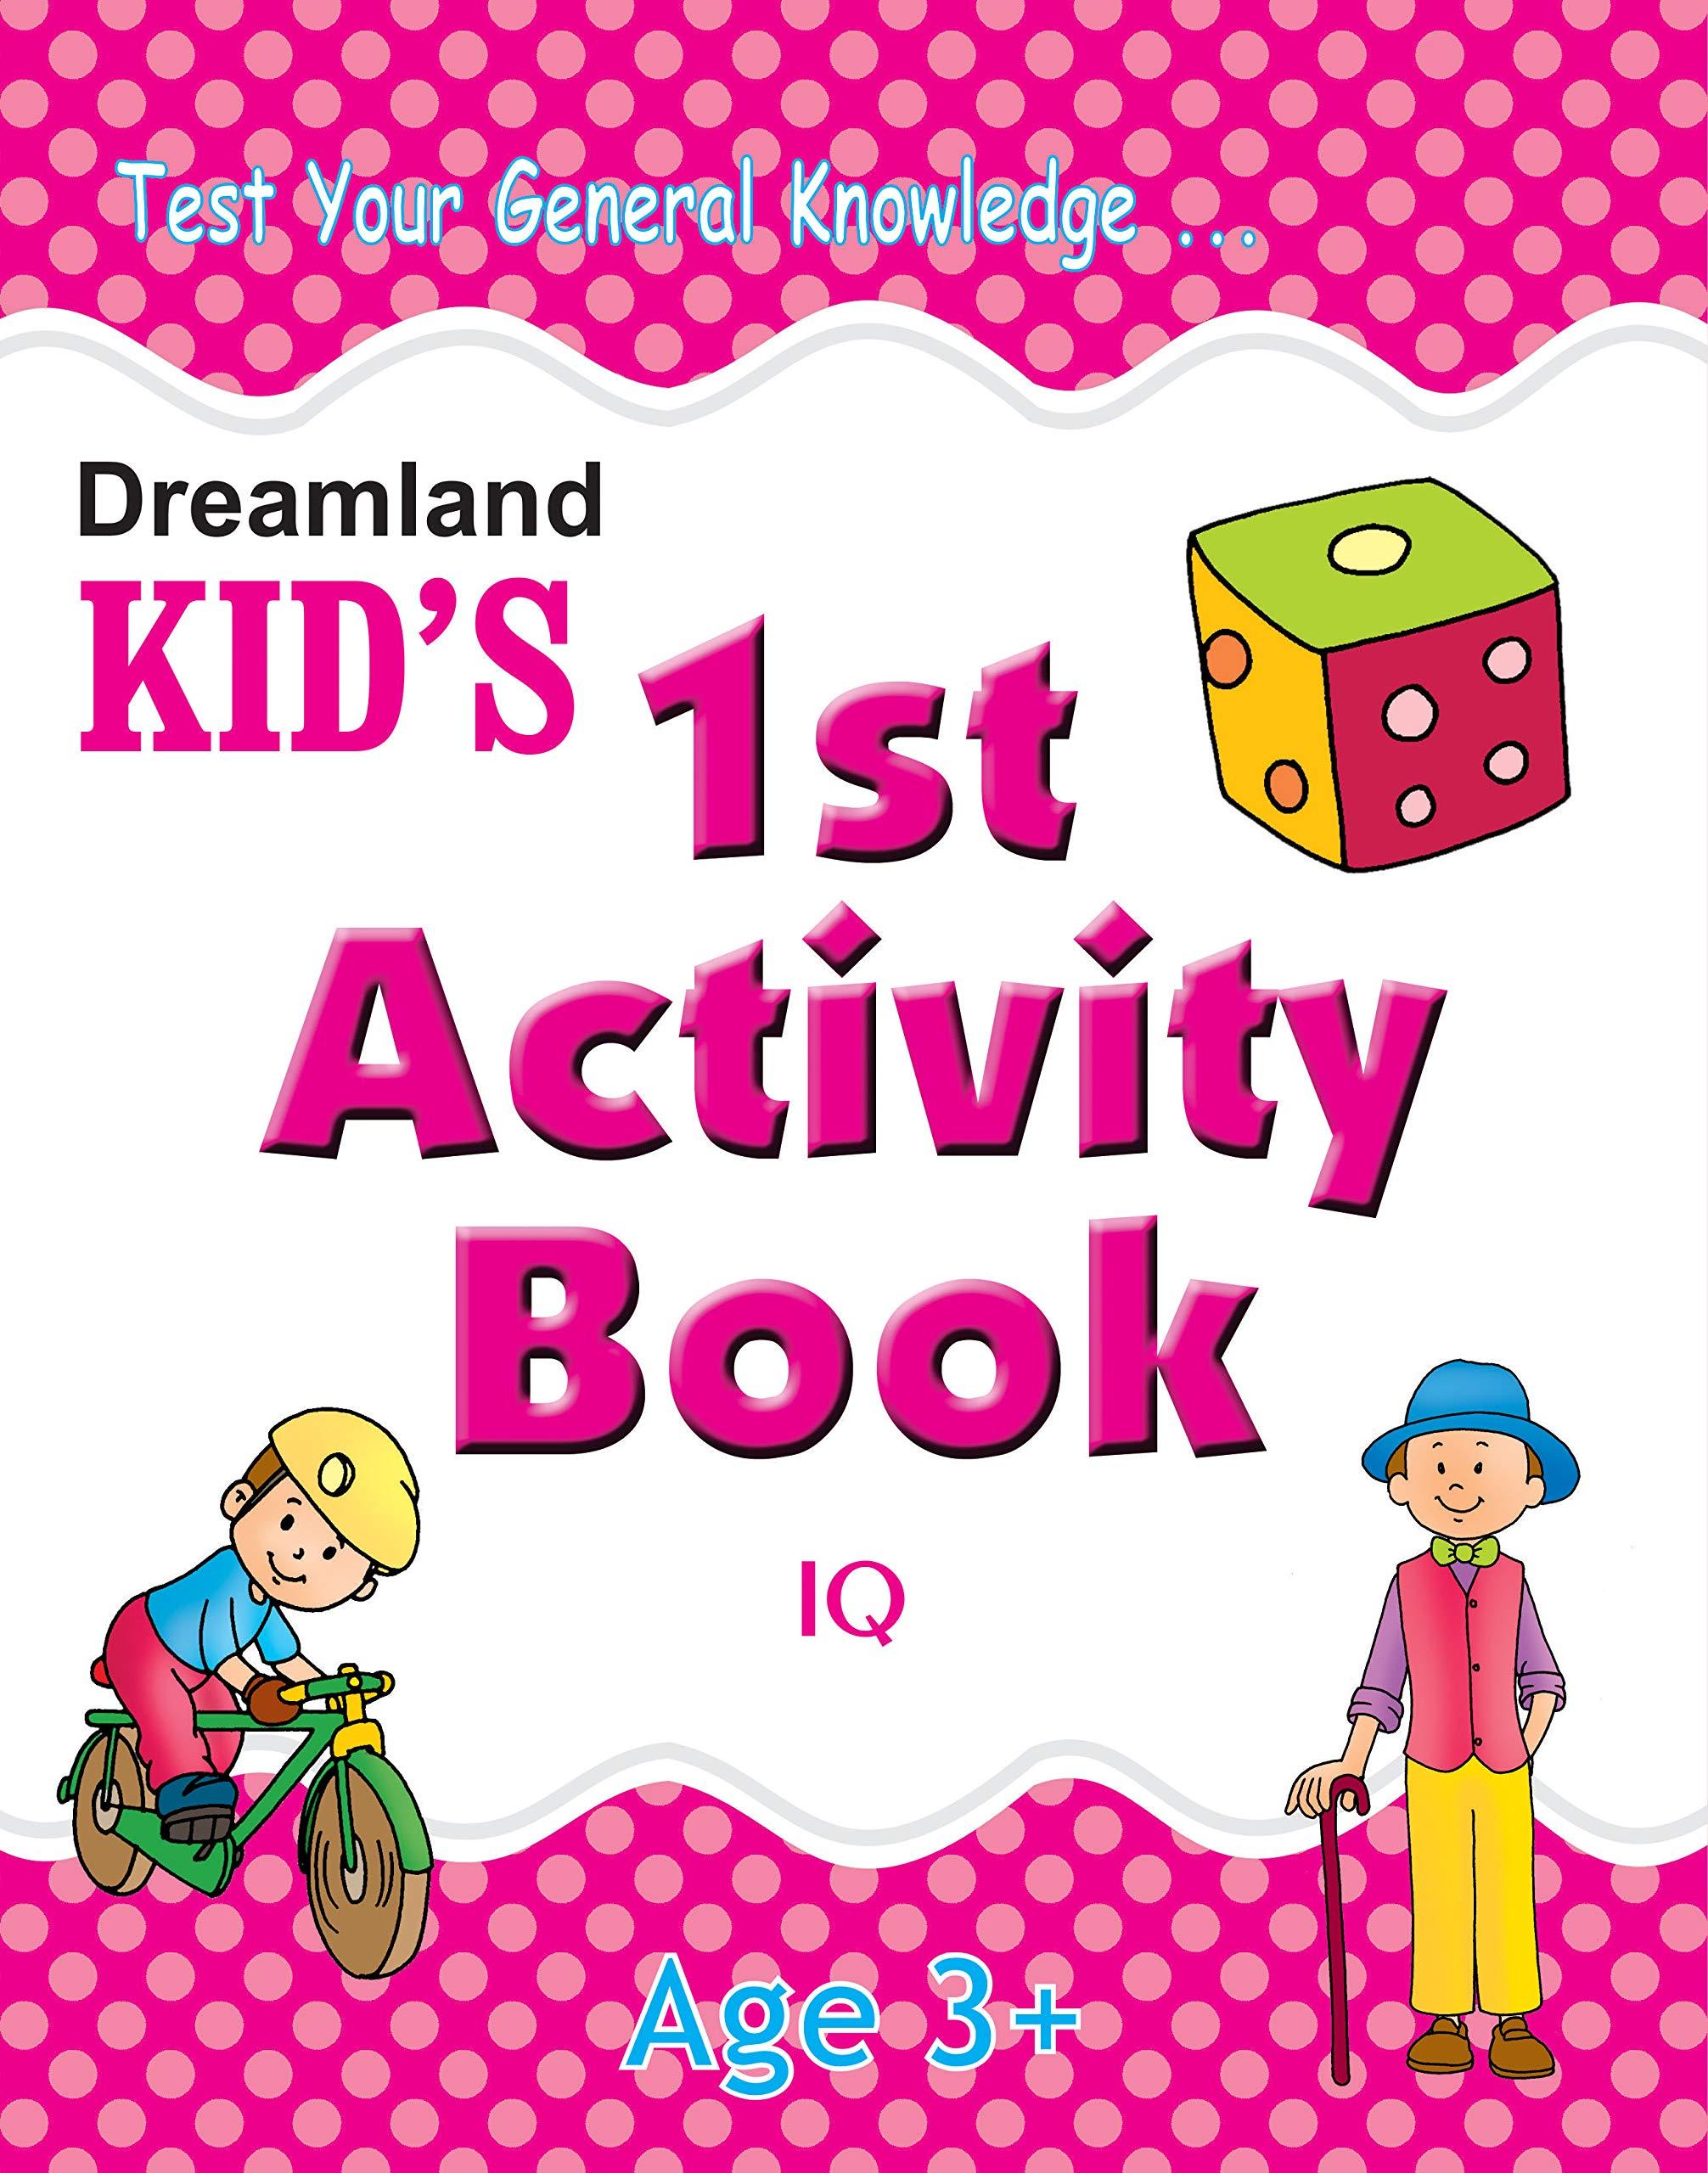 1st Activity Book – IQ (Kid's Activity Books)